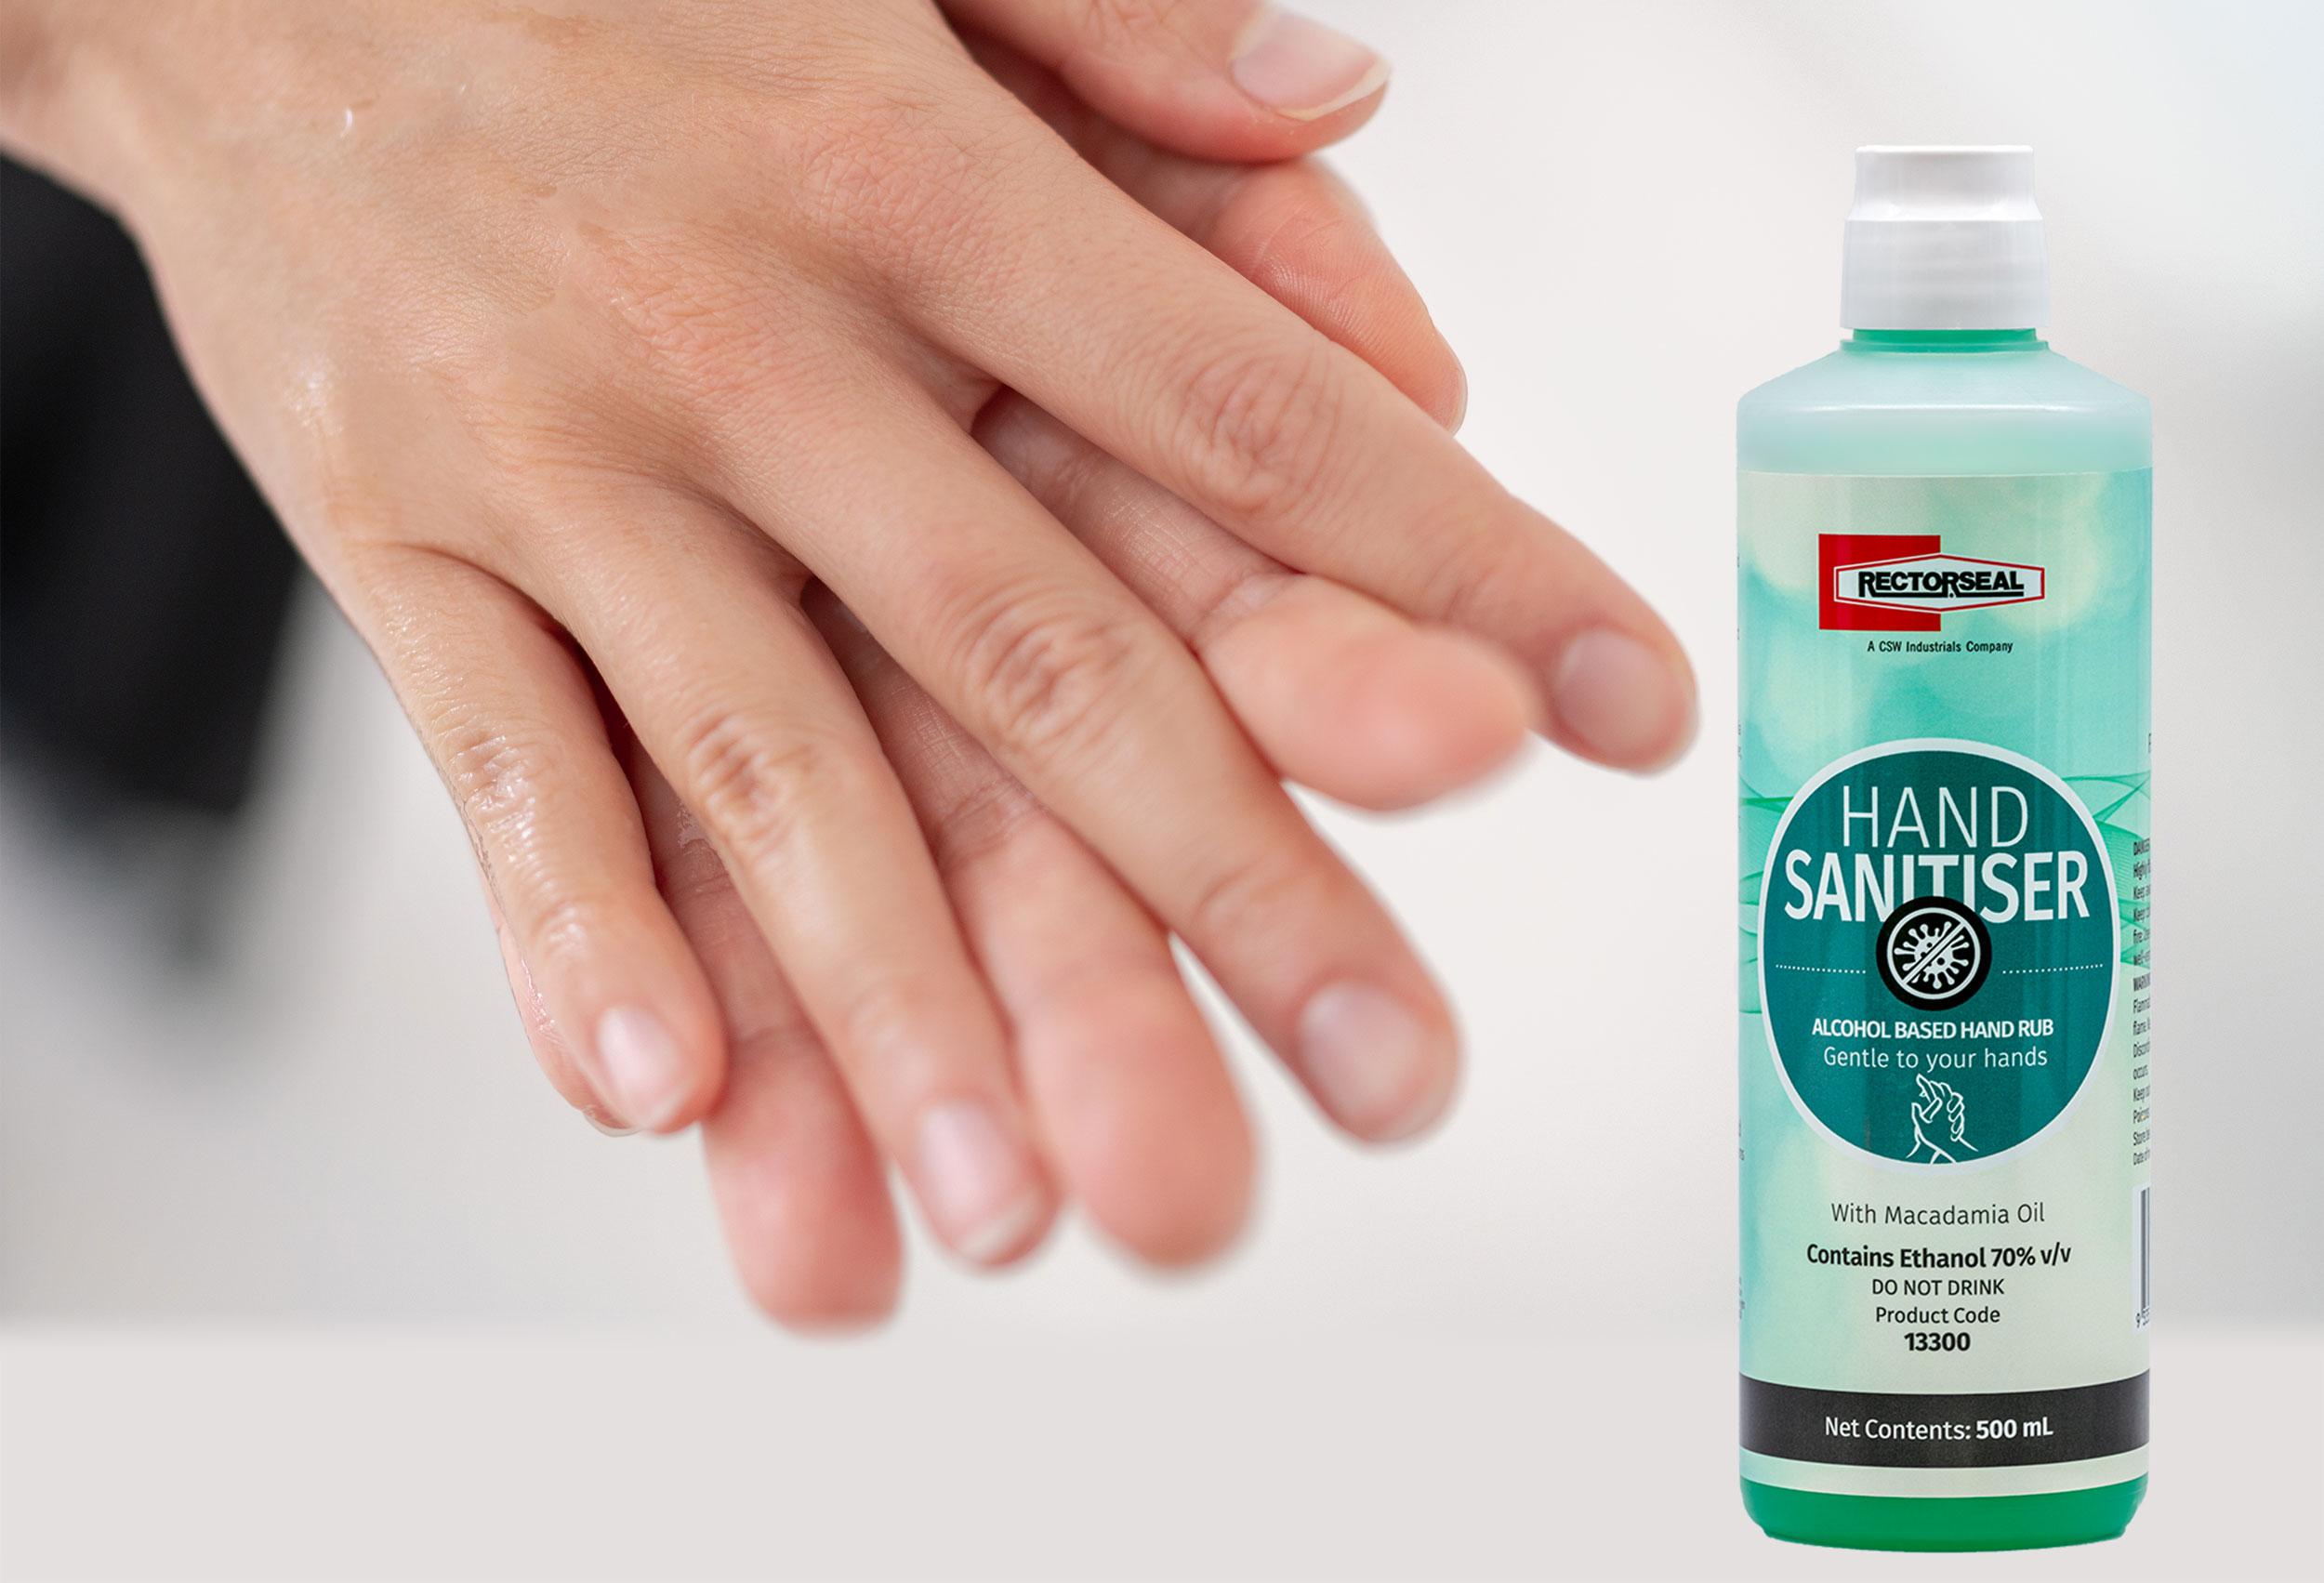 Australia Hand Waterless Sanitiser application image